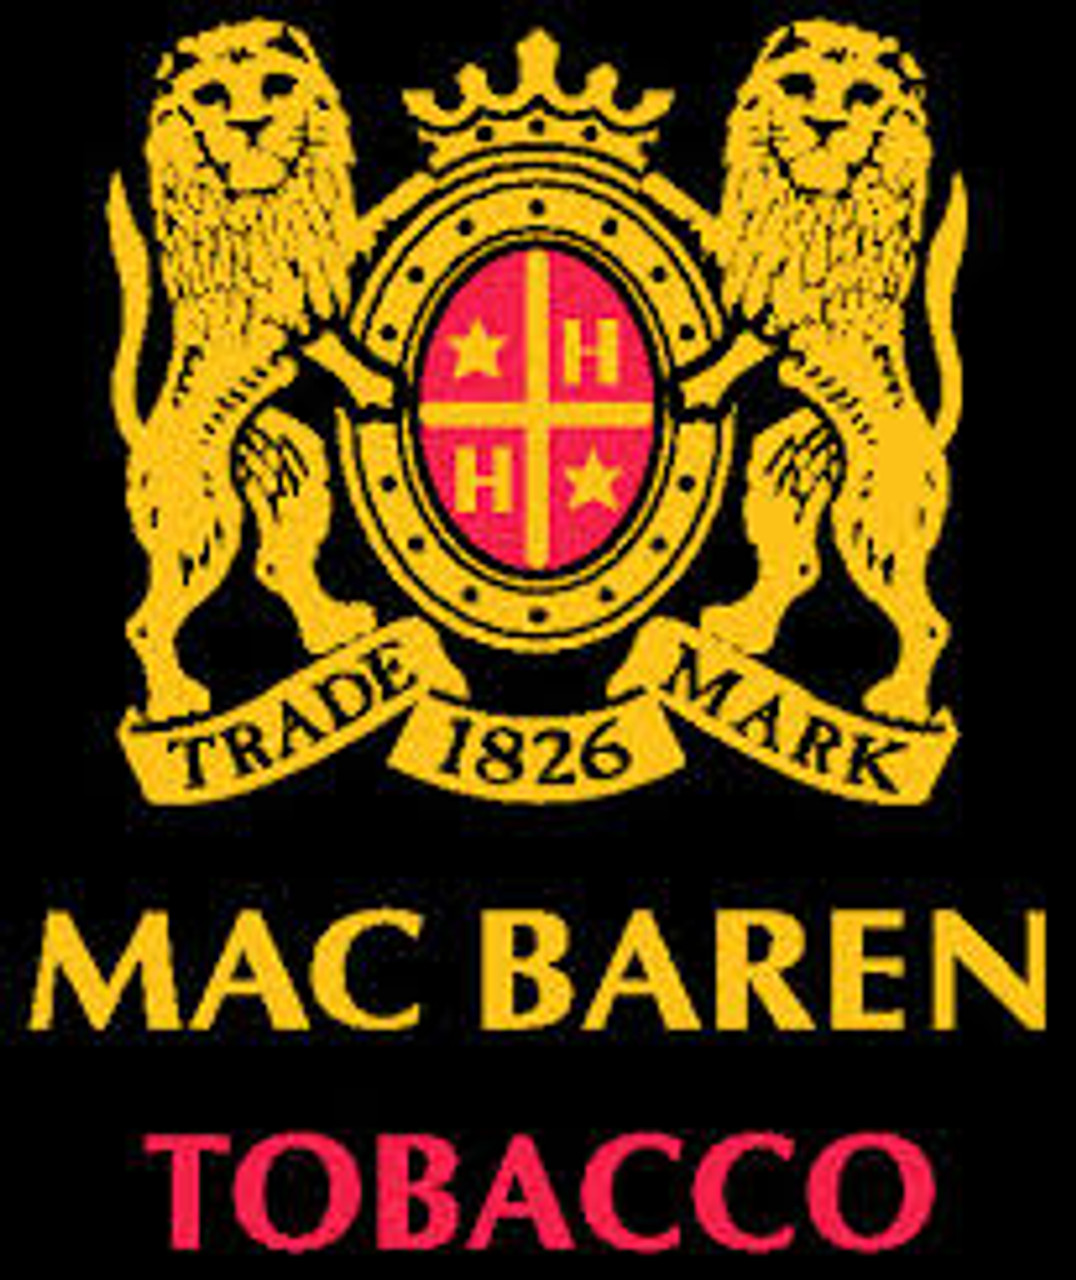 Mac Baren Original Choice Pipe Tobacco | 3.5 OZ TIN